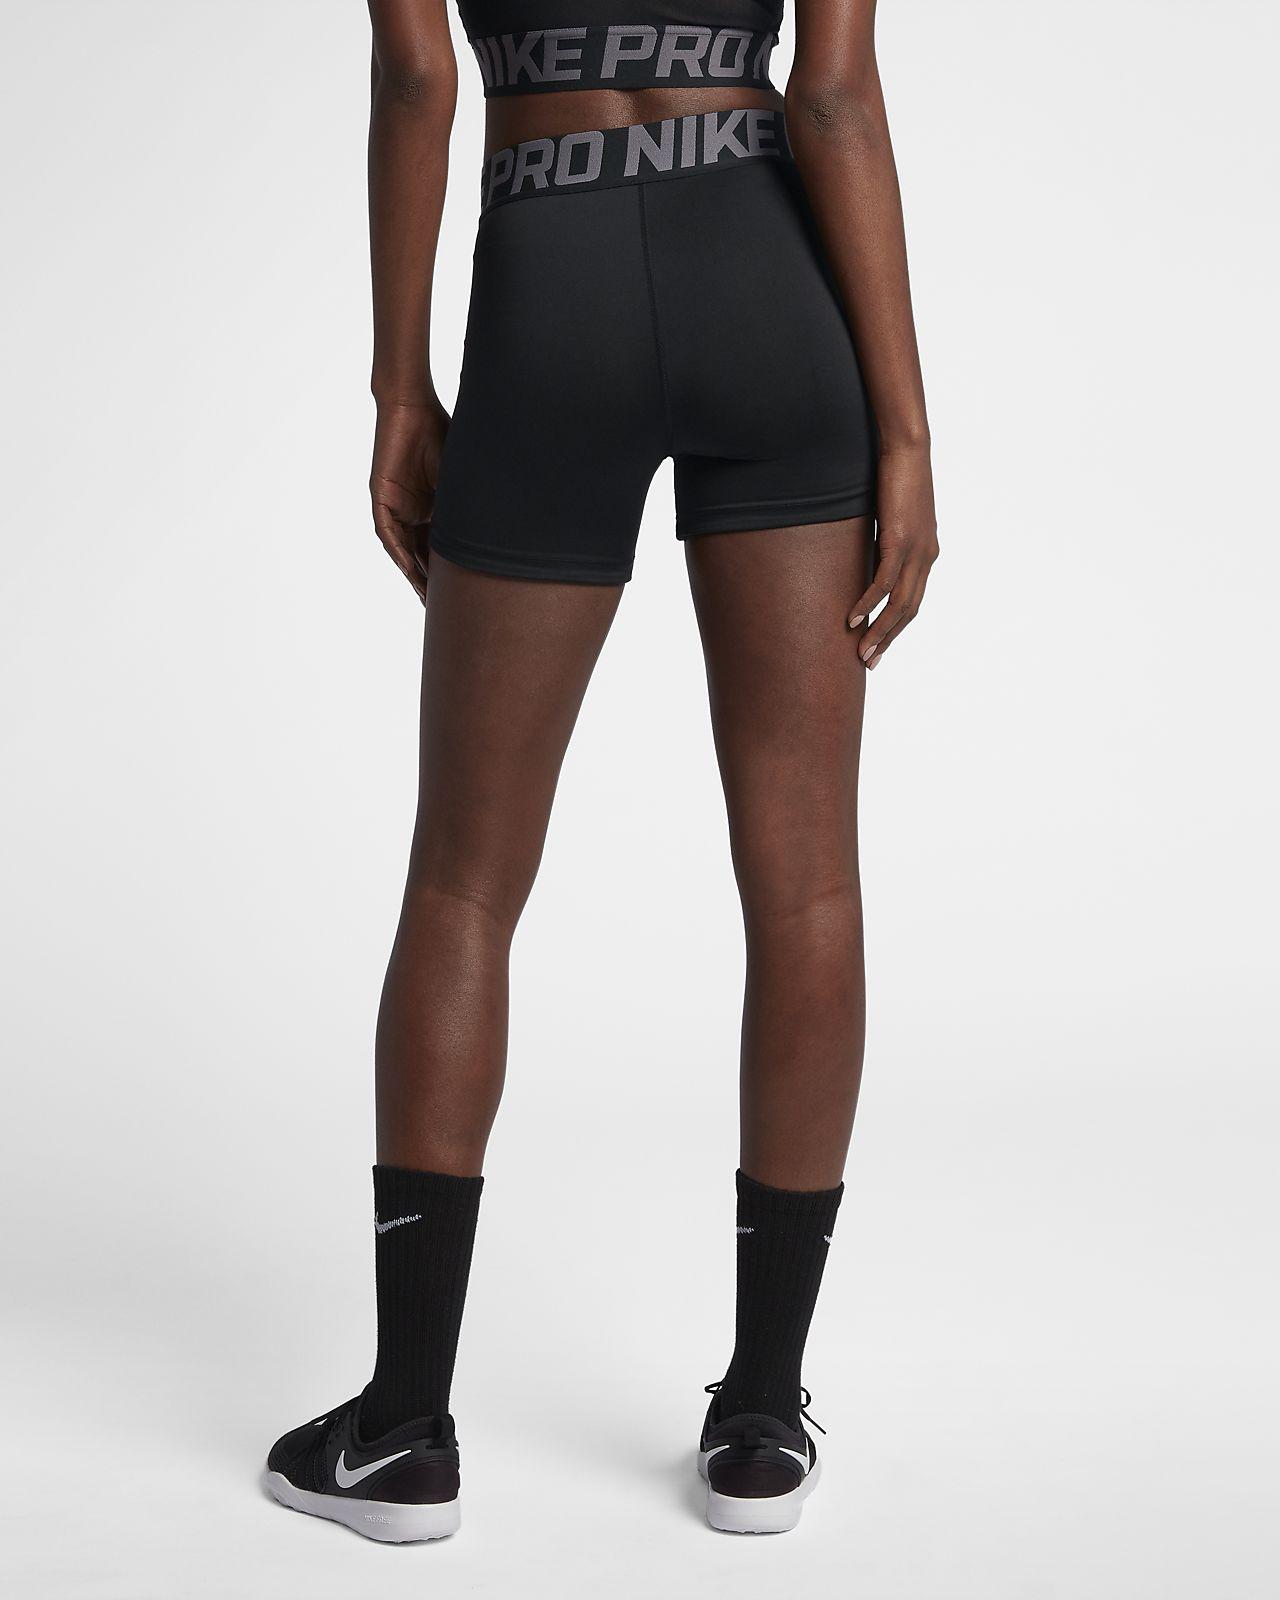 5 shorts womens